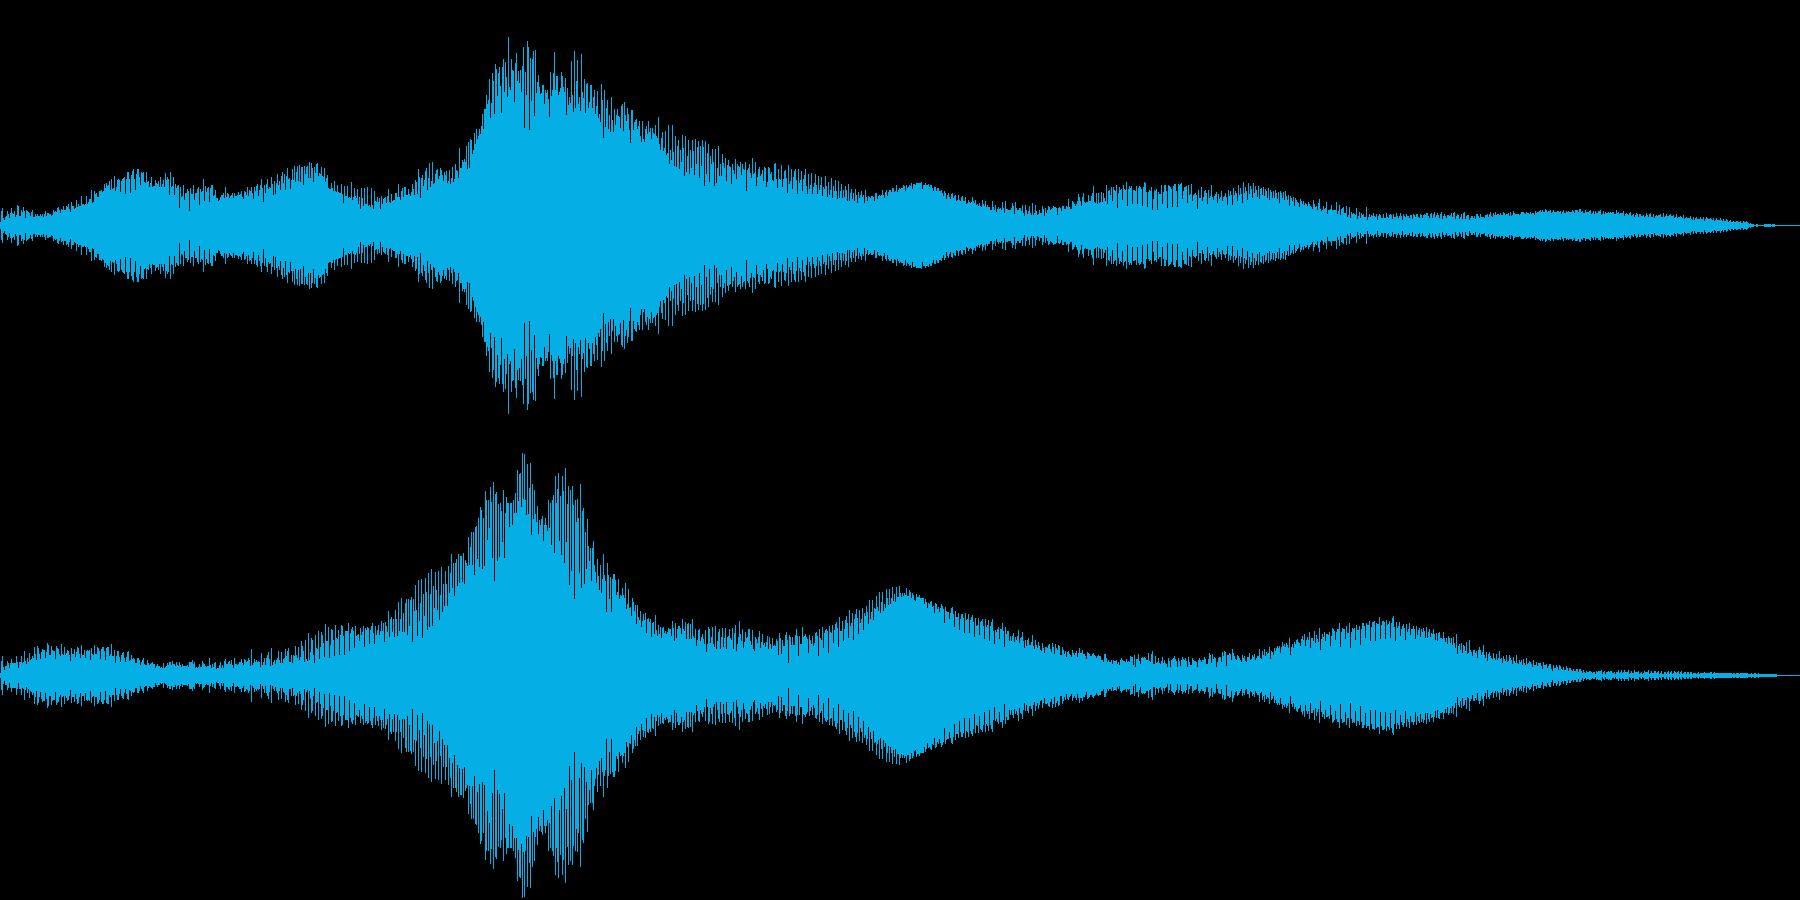 Electron Pad ダーティーの再生済みの波形